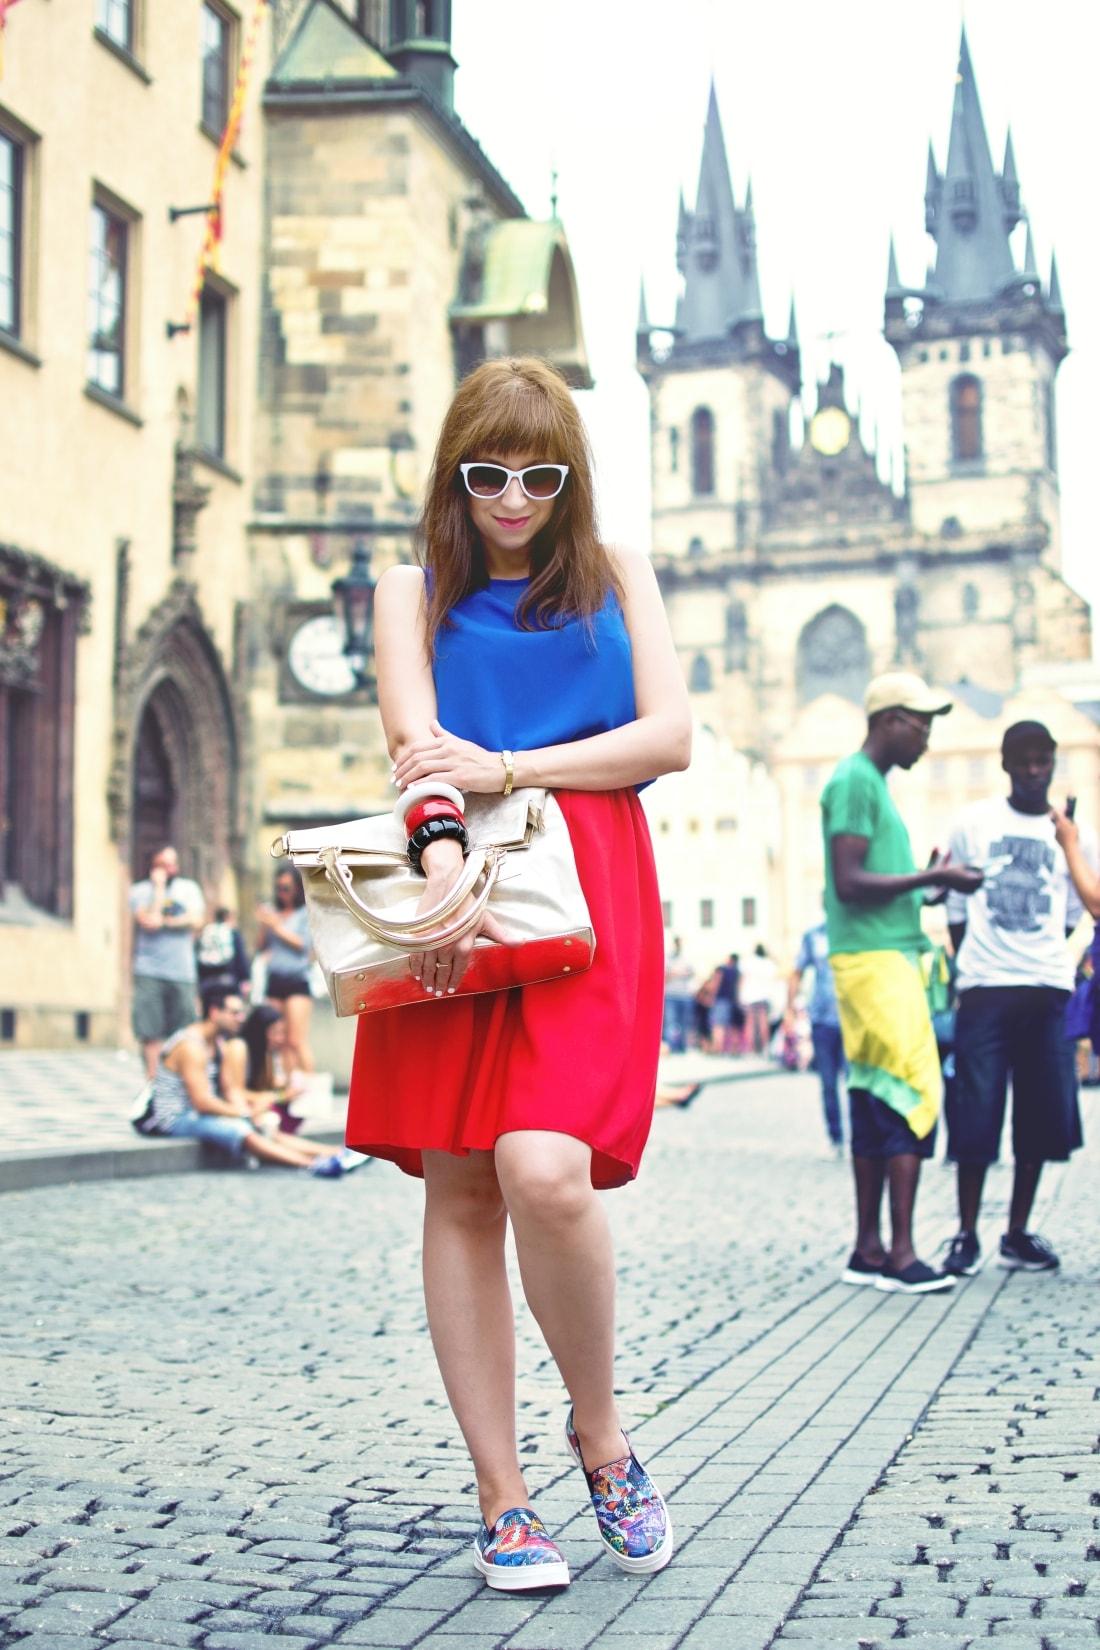 katharine-fashion-is-beautiful-blog-colorblocking-4